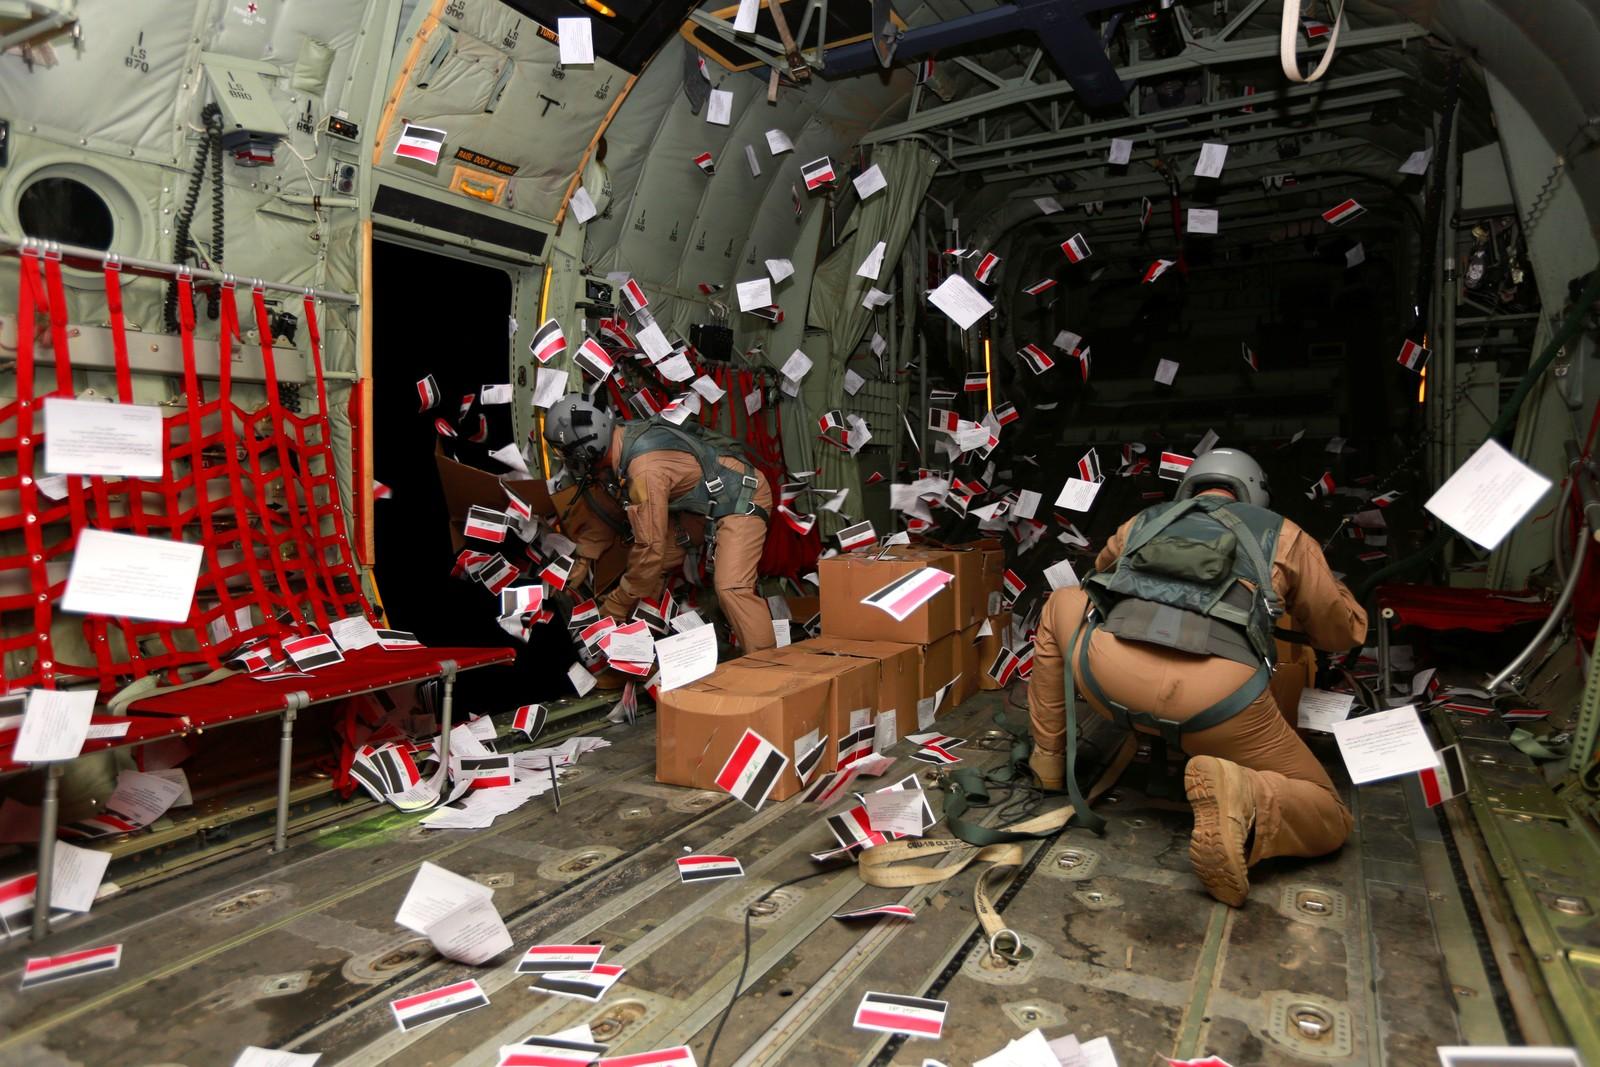 Flyvende blad. Irakiske soldater slipper flyveblad fra et fly over byen Mosul.